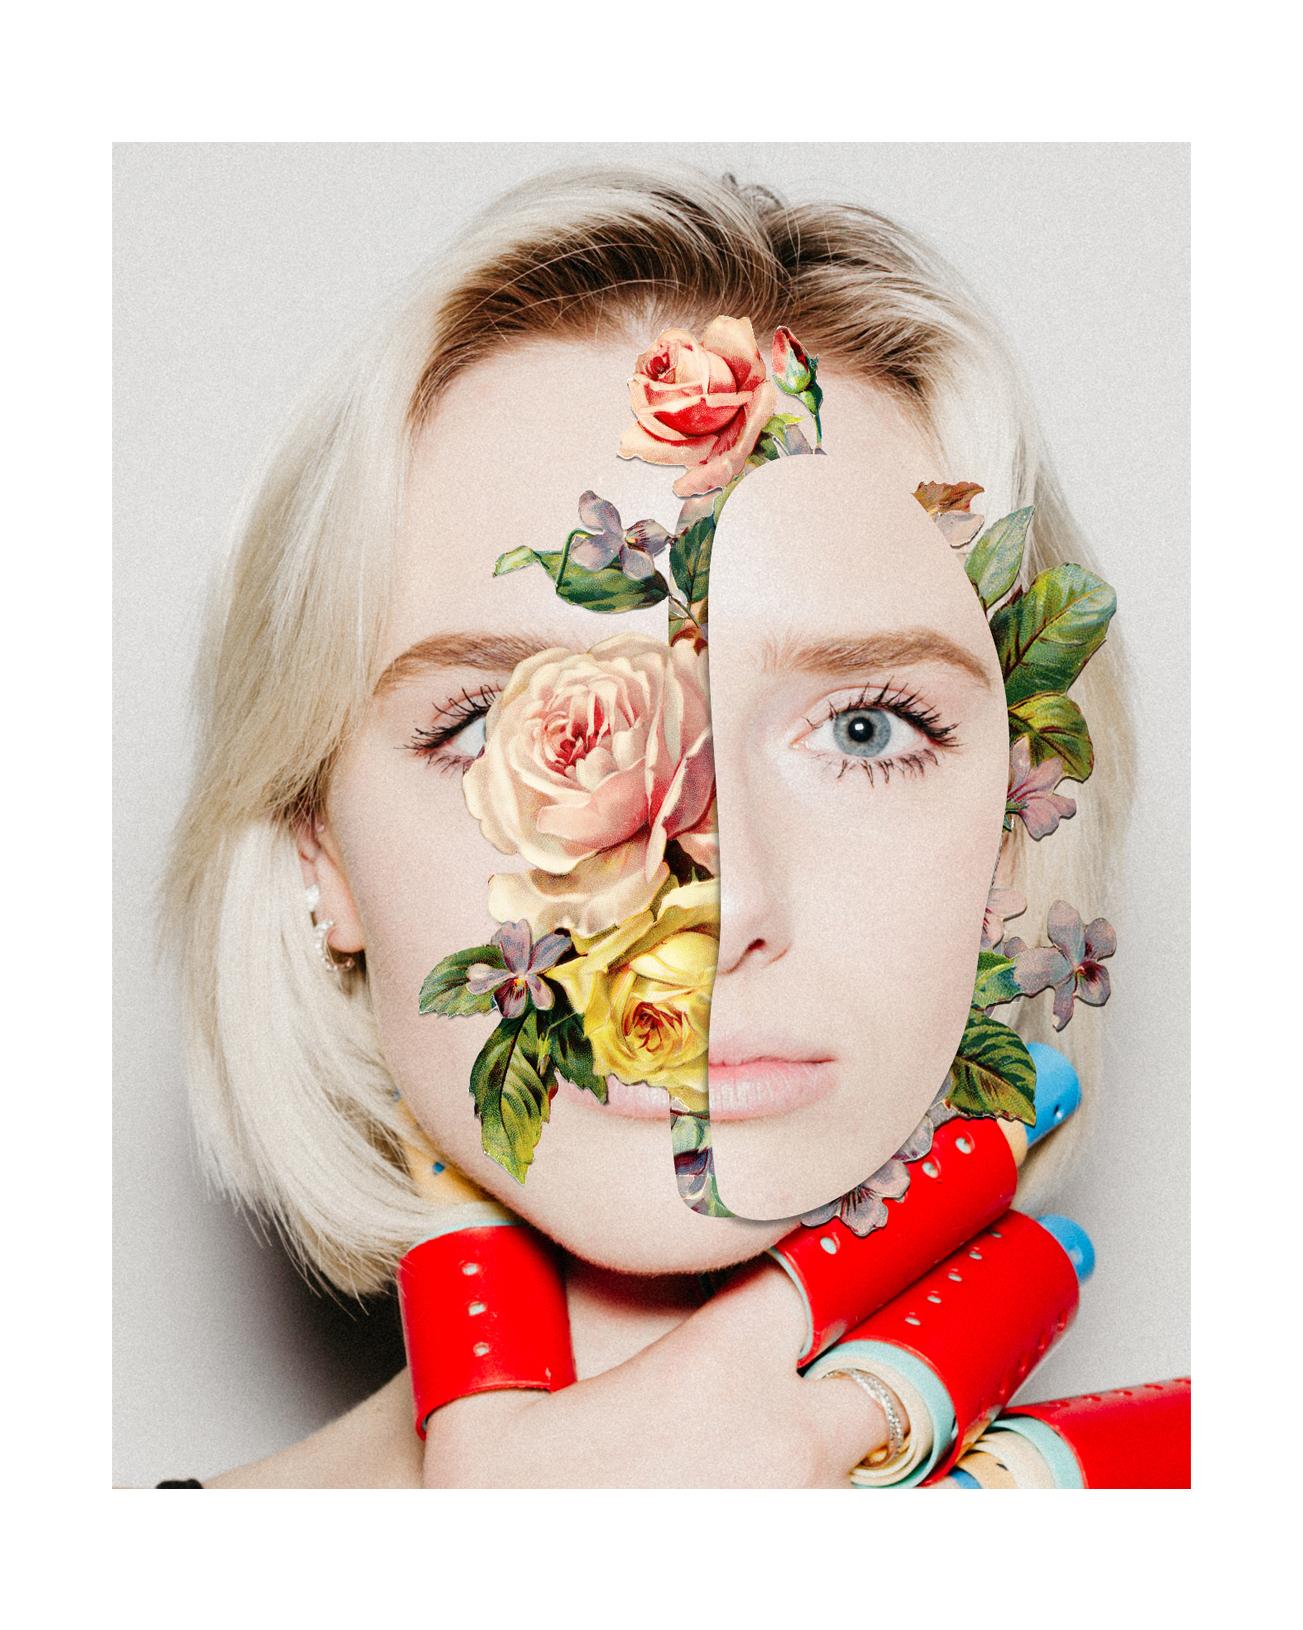 Grace-Floral-Innerds-Portrait-DROP.jpg